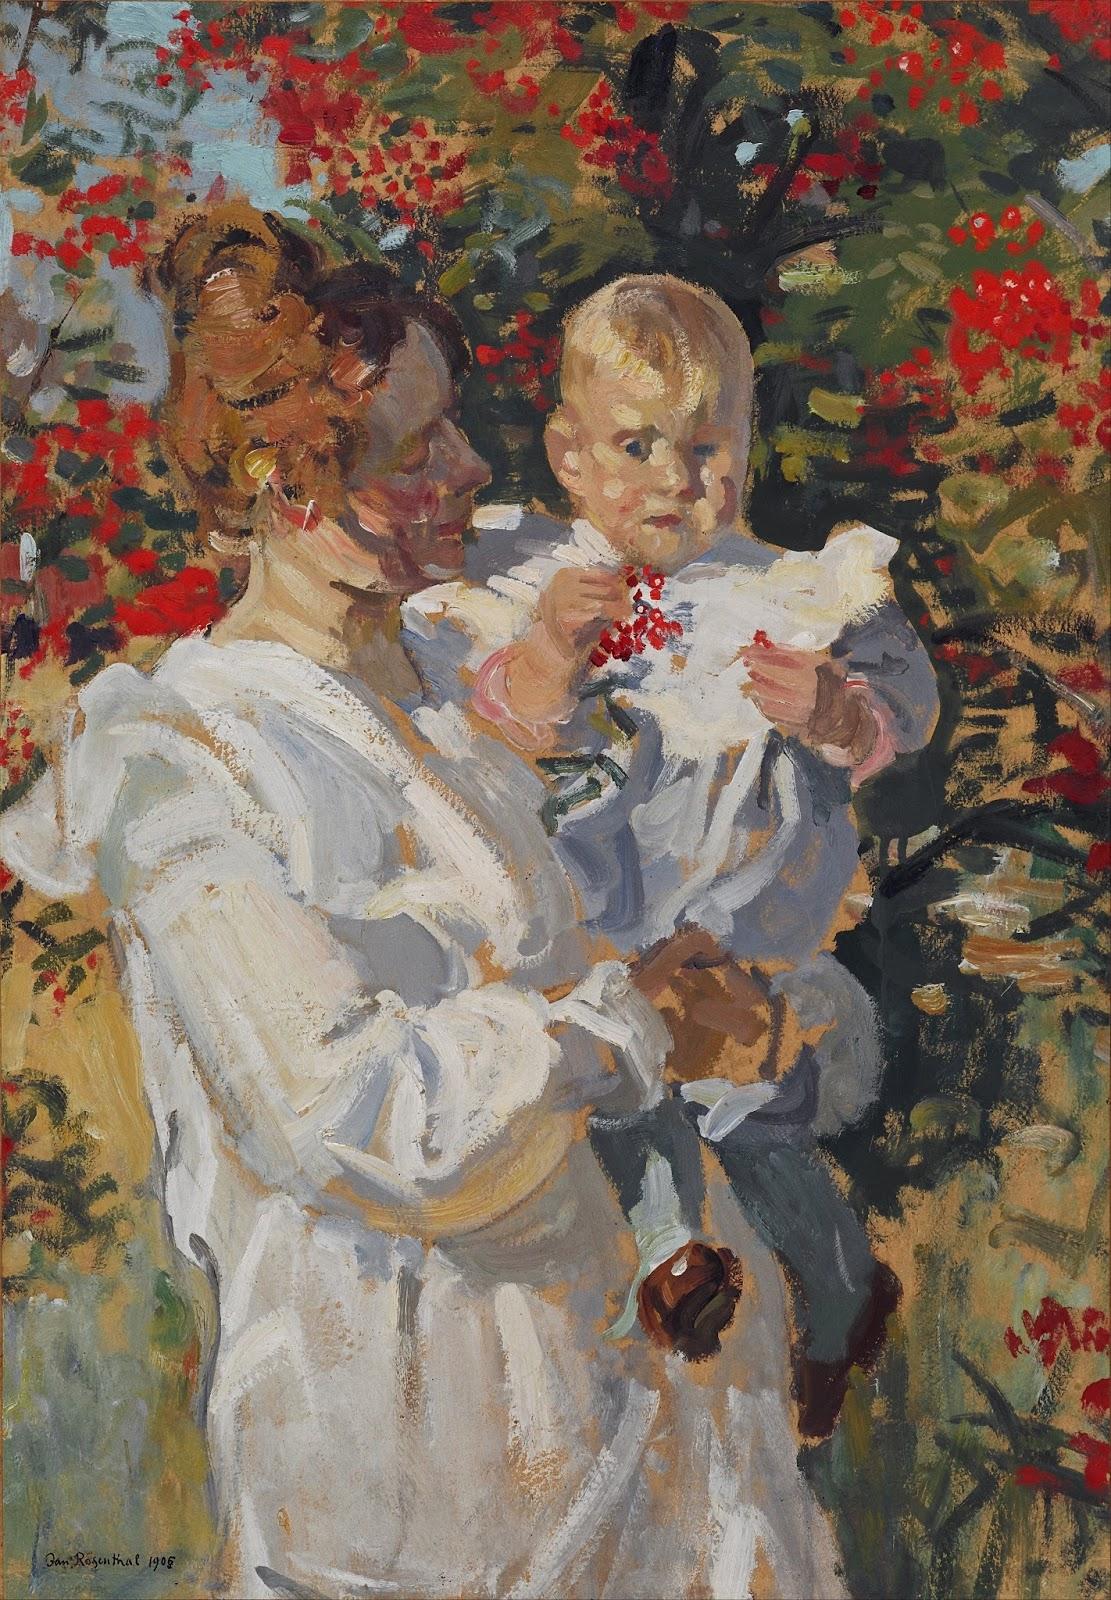 Janis Rozenthal - Under the Rowan Tree